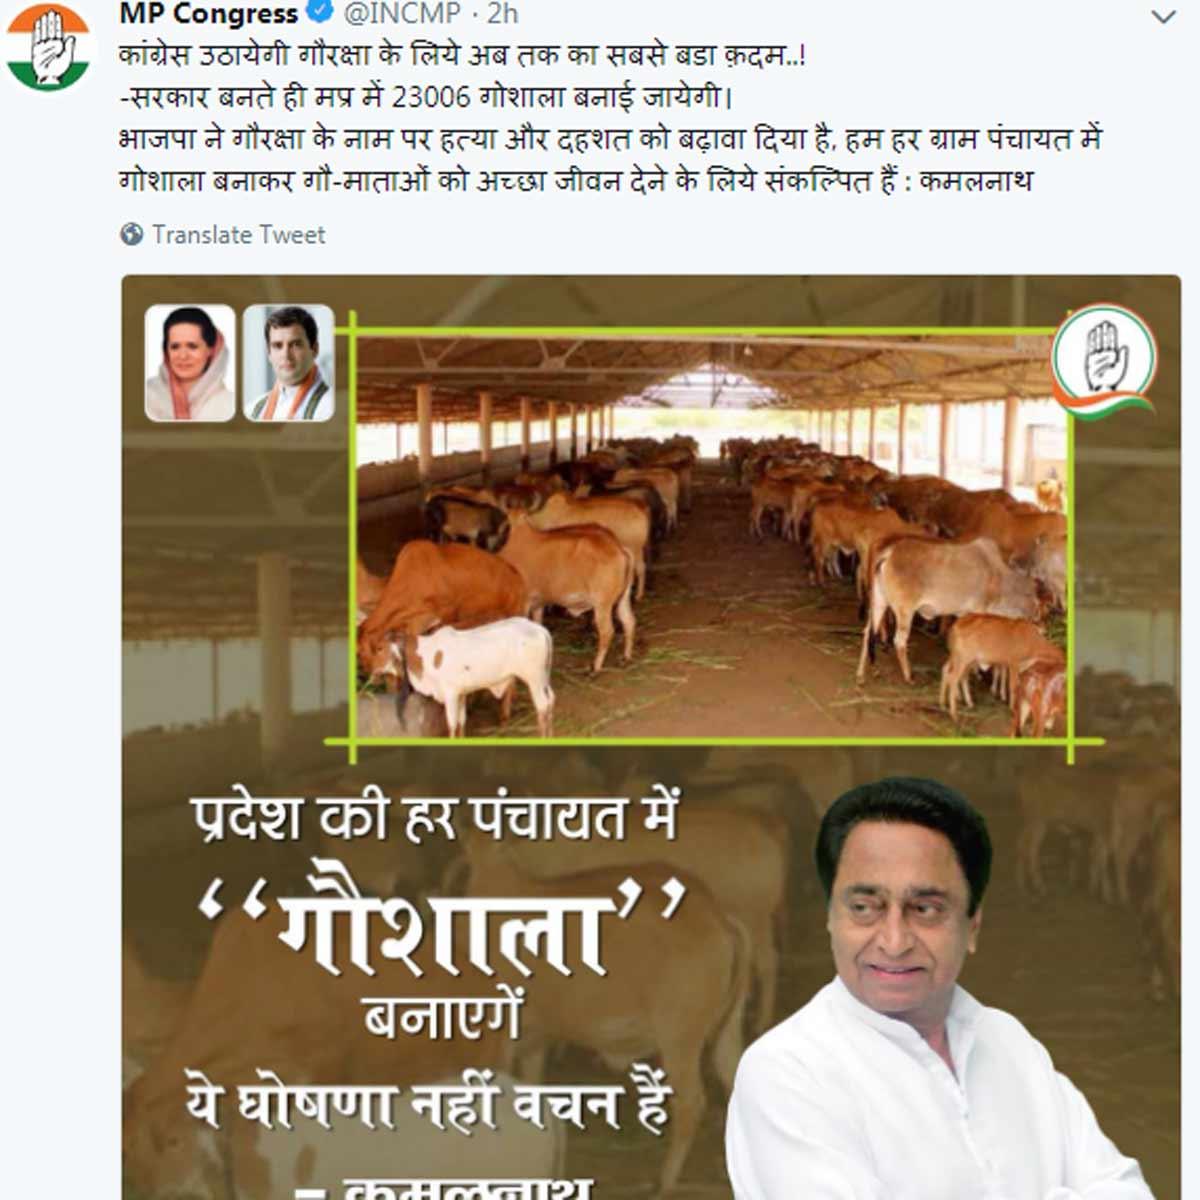 mp-congres-tweet